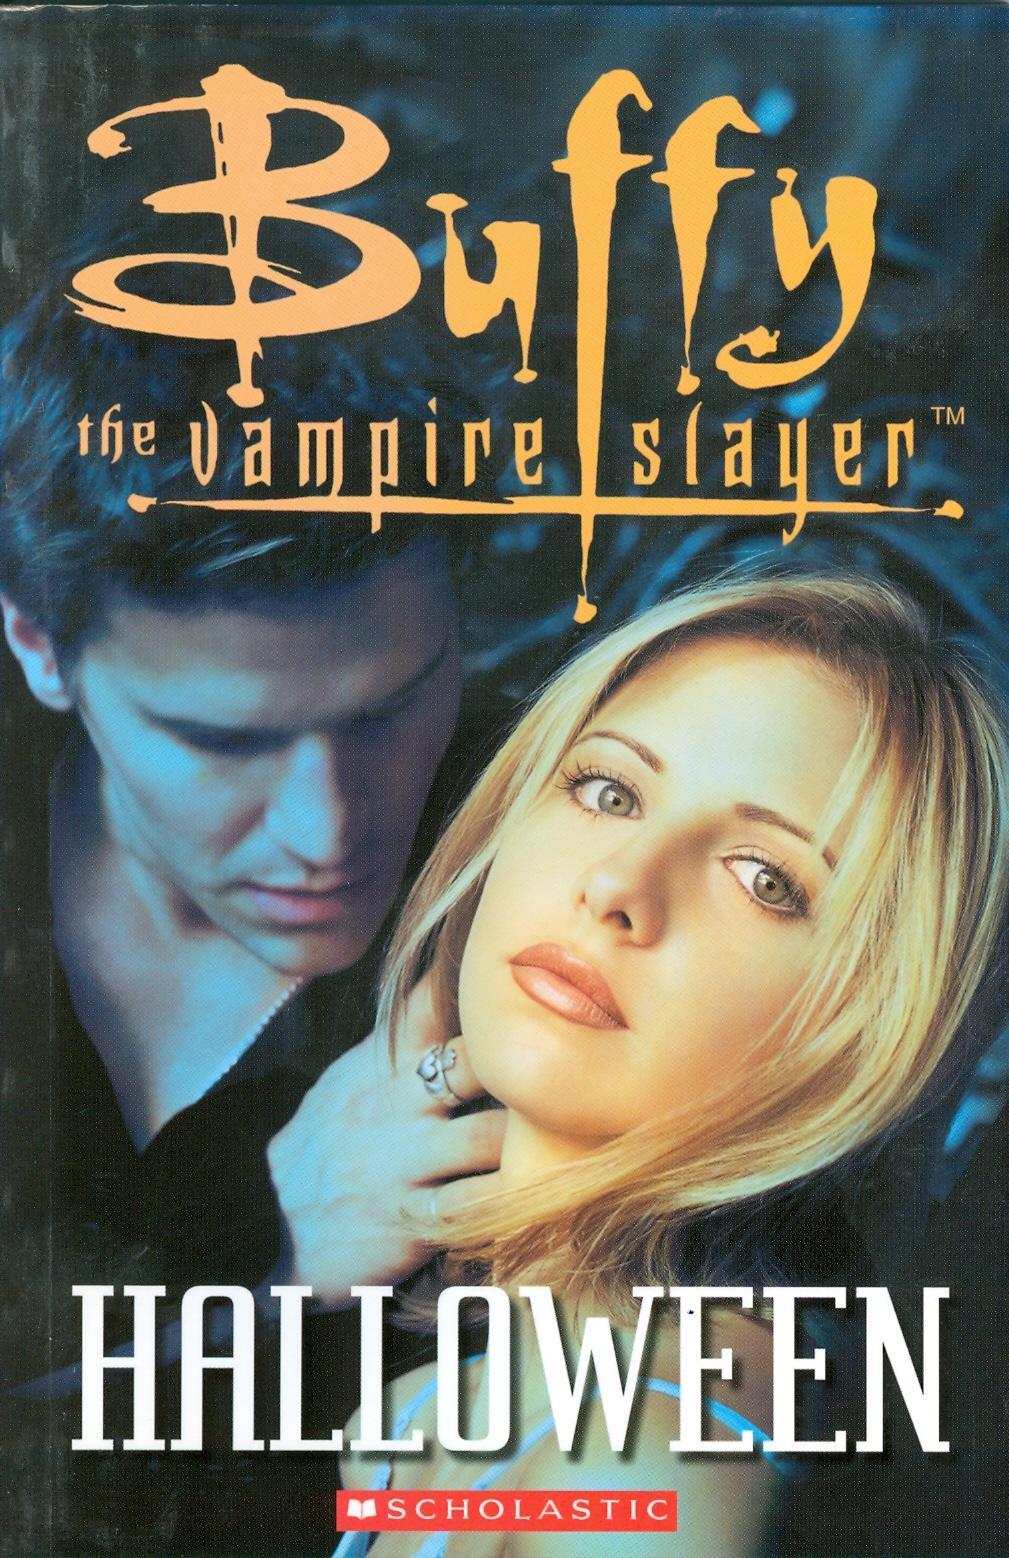 BUFFY THE VAMPIRE SLAYER: HALLOWE'EN / LEVEL 1